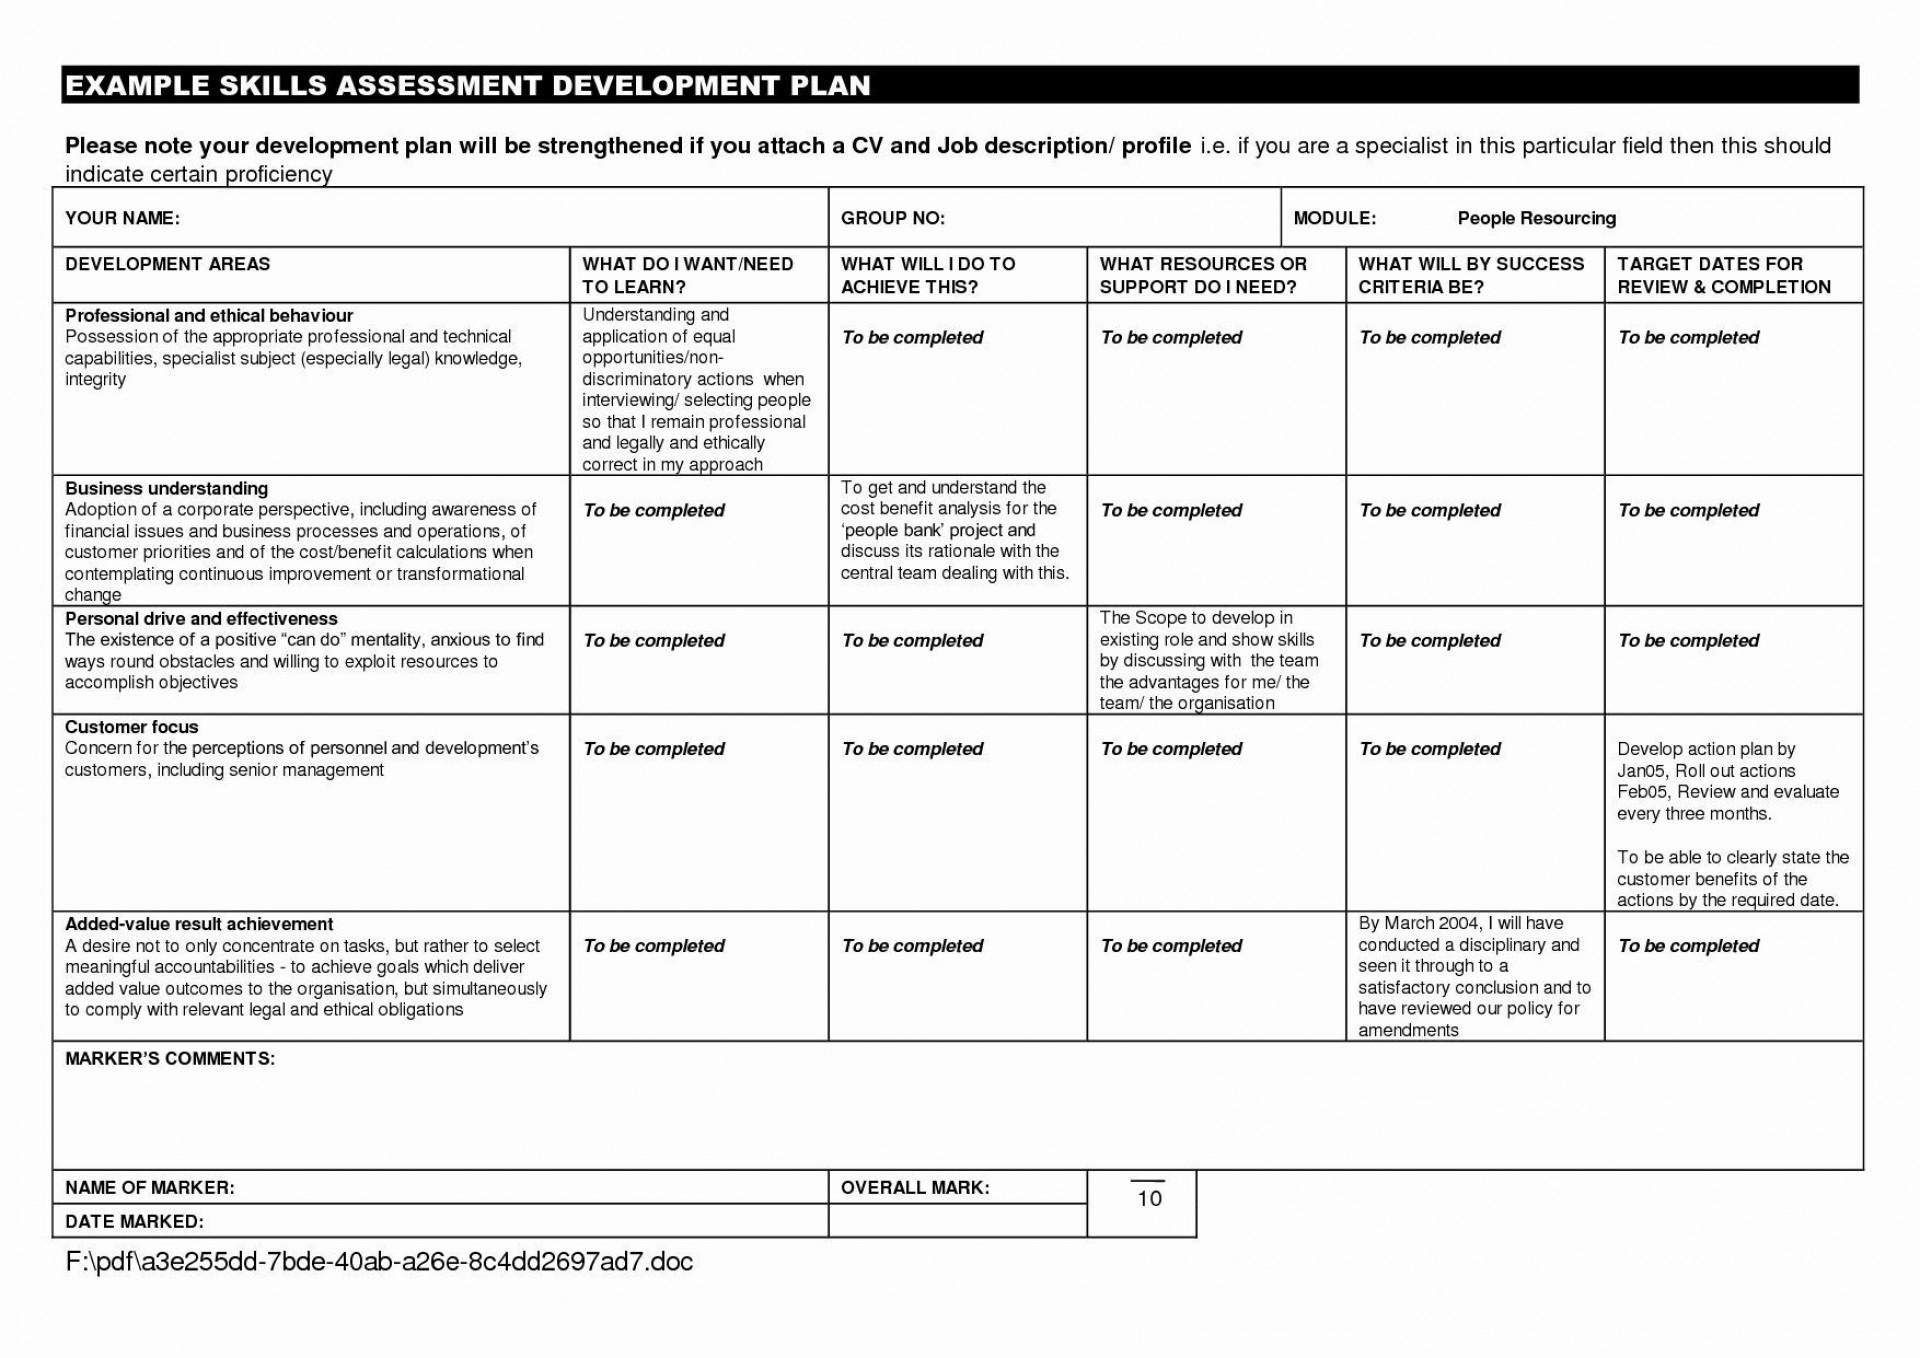 008 Awful Employee Development Plan Goal Example Design  Examples1920